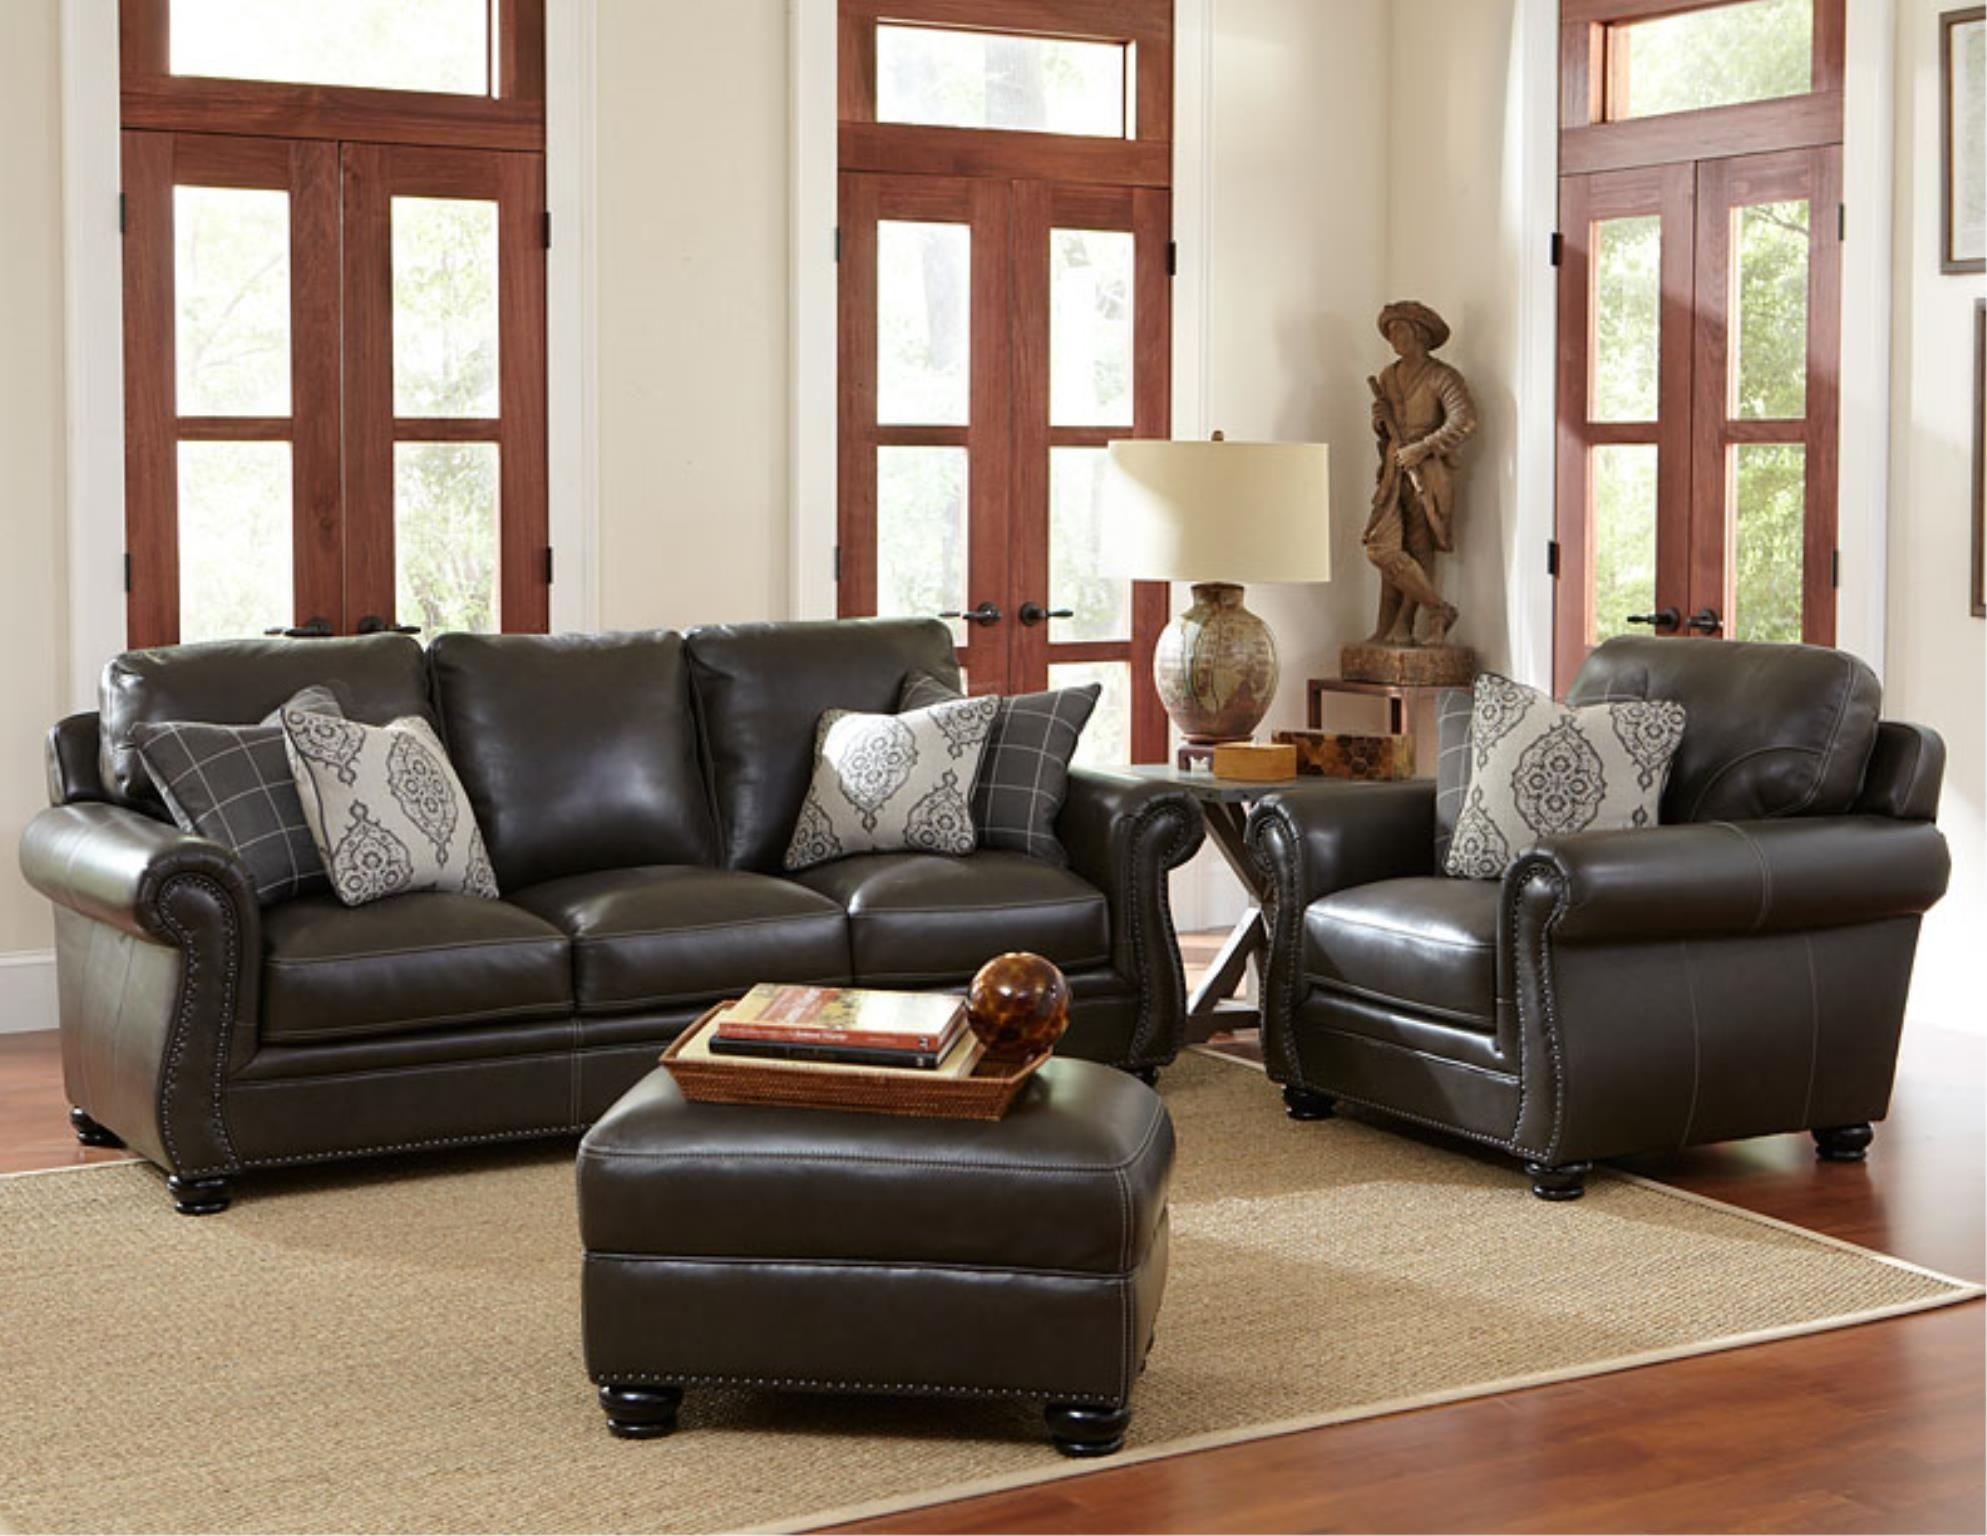 Charleston Longhorn Ghost Sofa From Simon Li | Coleman In Charleston Sofas (View 4 of 15)